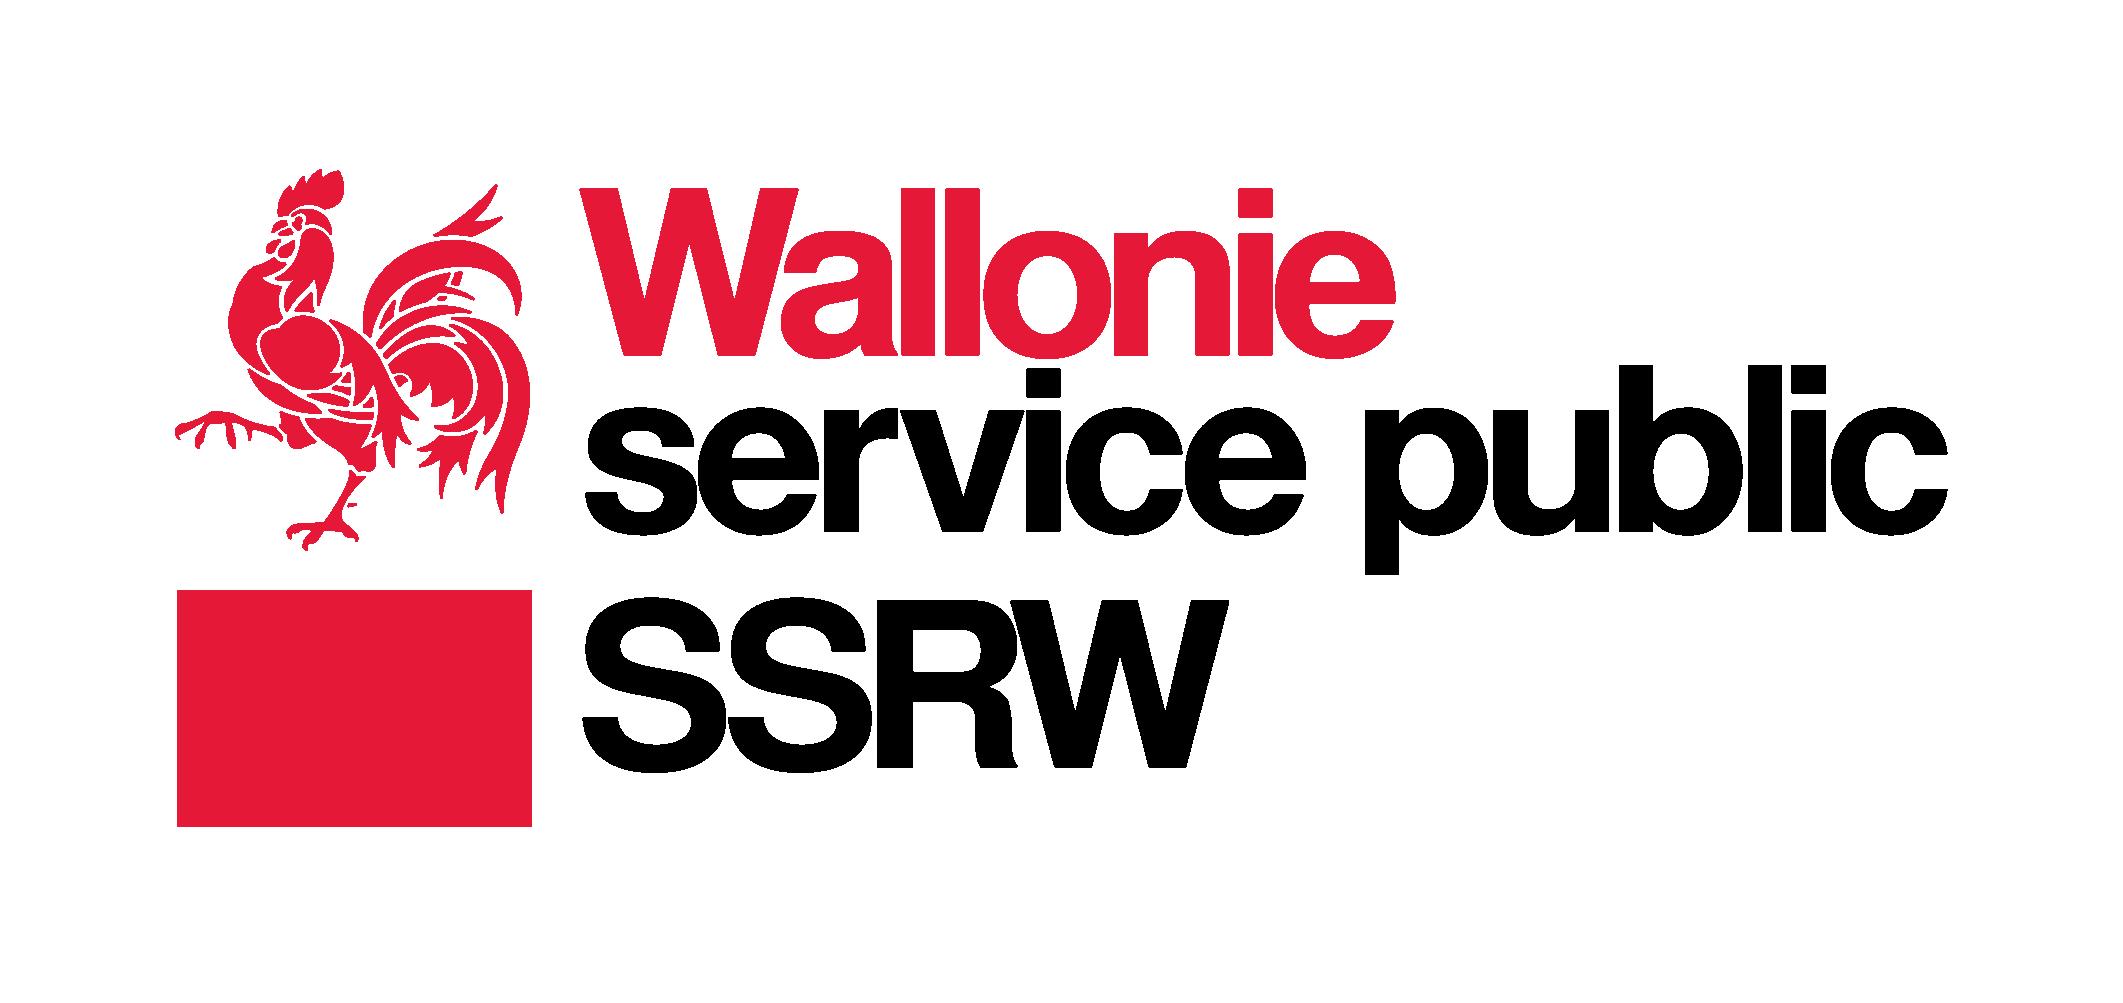 Chambre Wallone